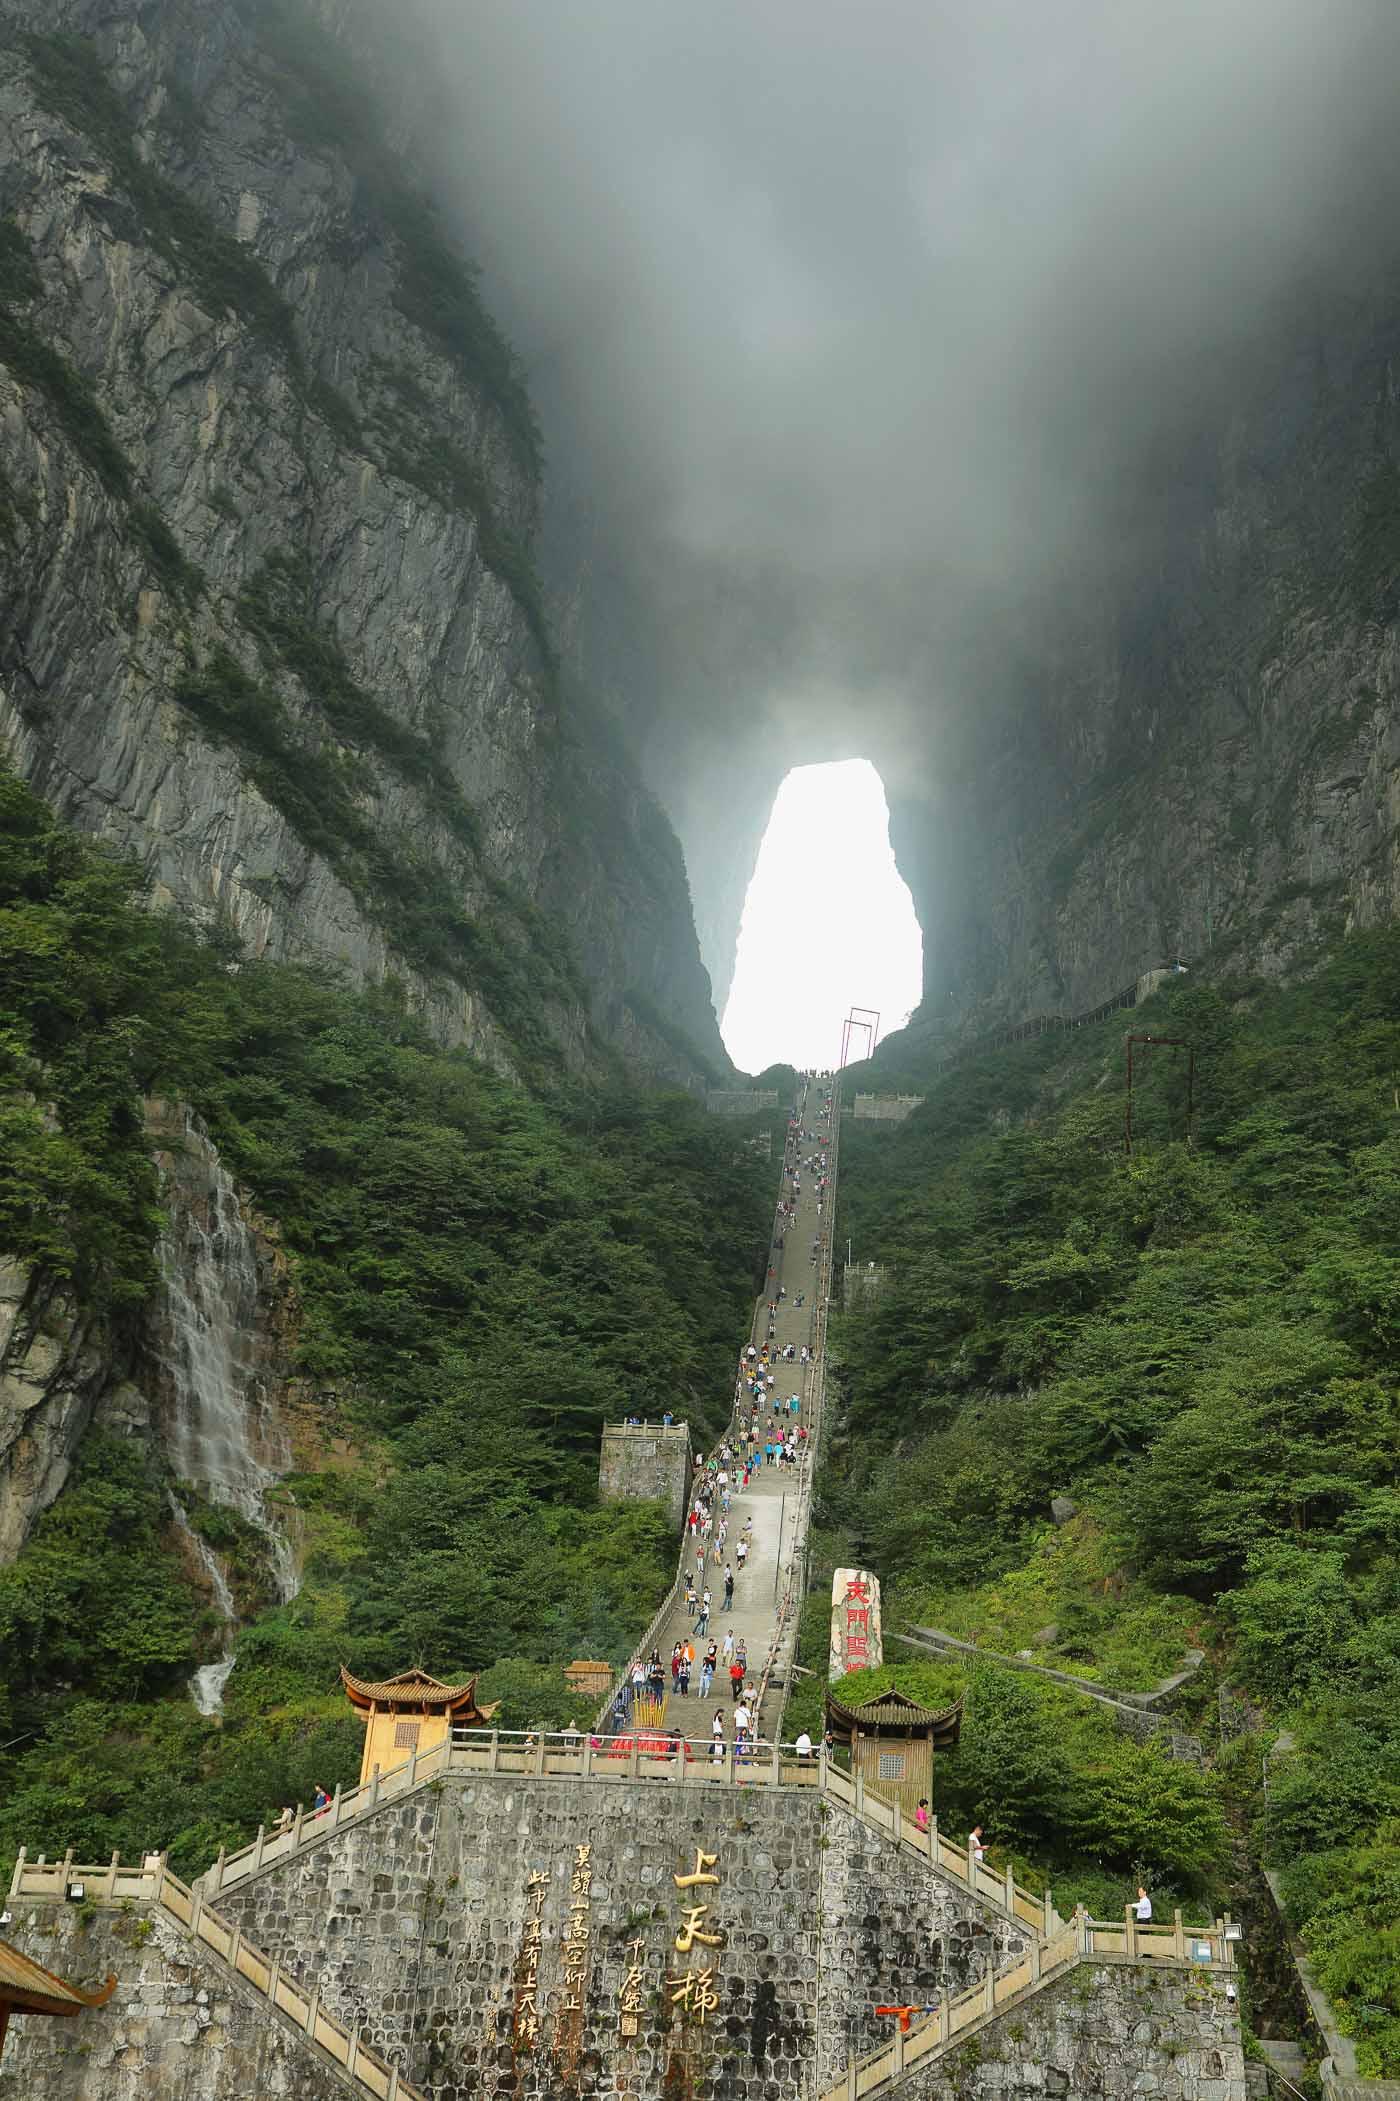 Memorable Staircase Designs - Tianmen cave, China